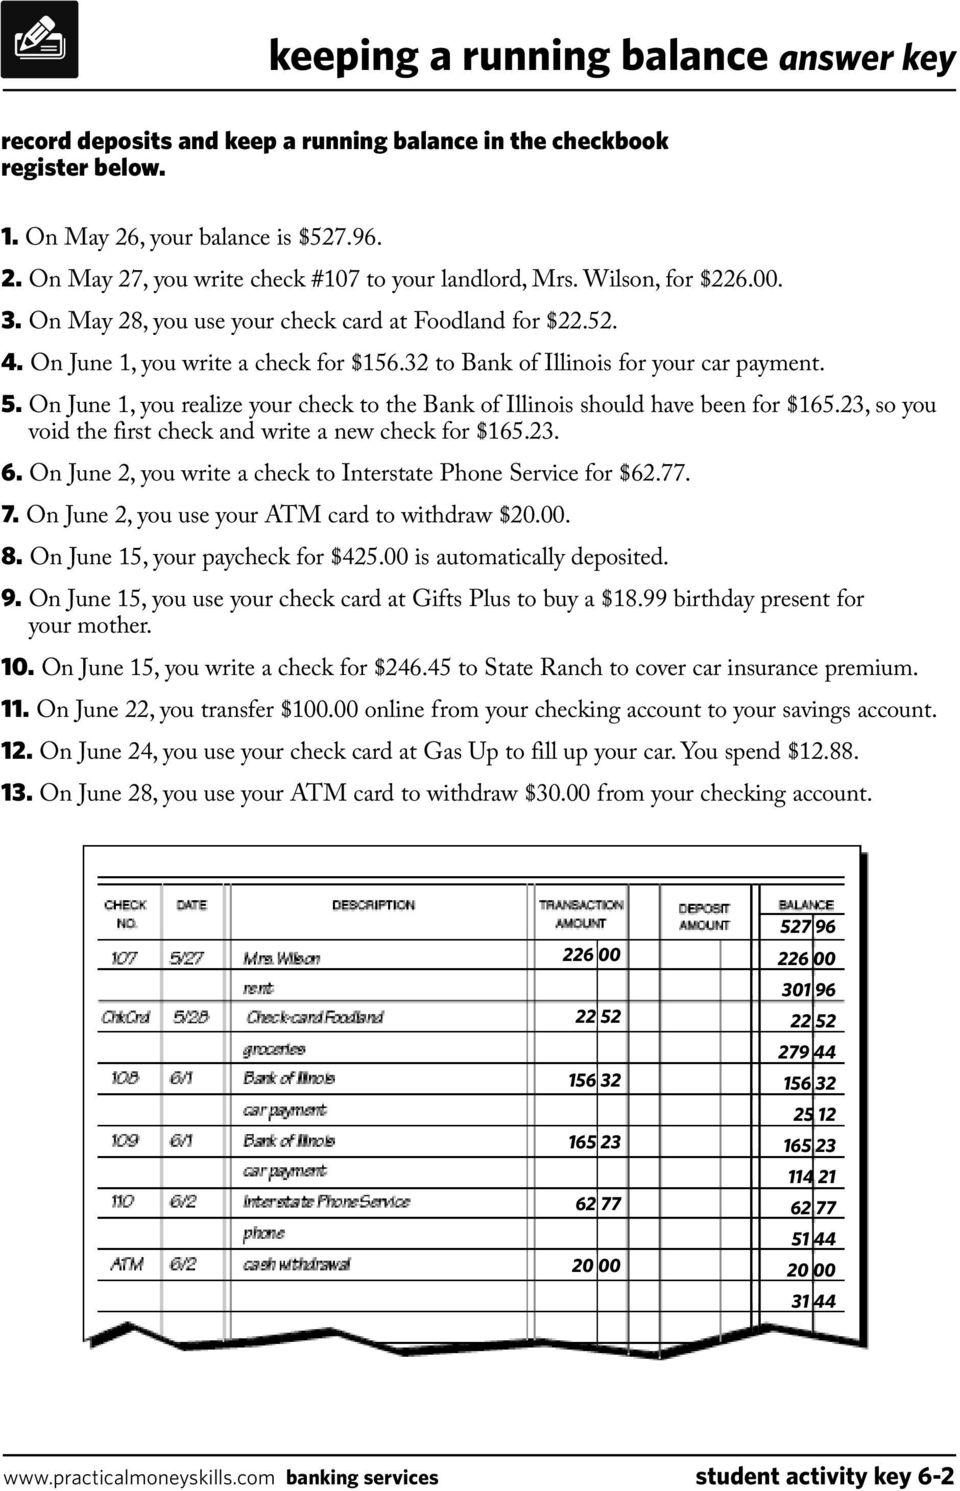 medium resolution of keeping a running balance answer key - PDF Free Download